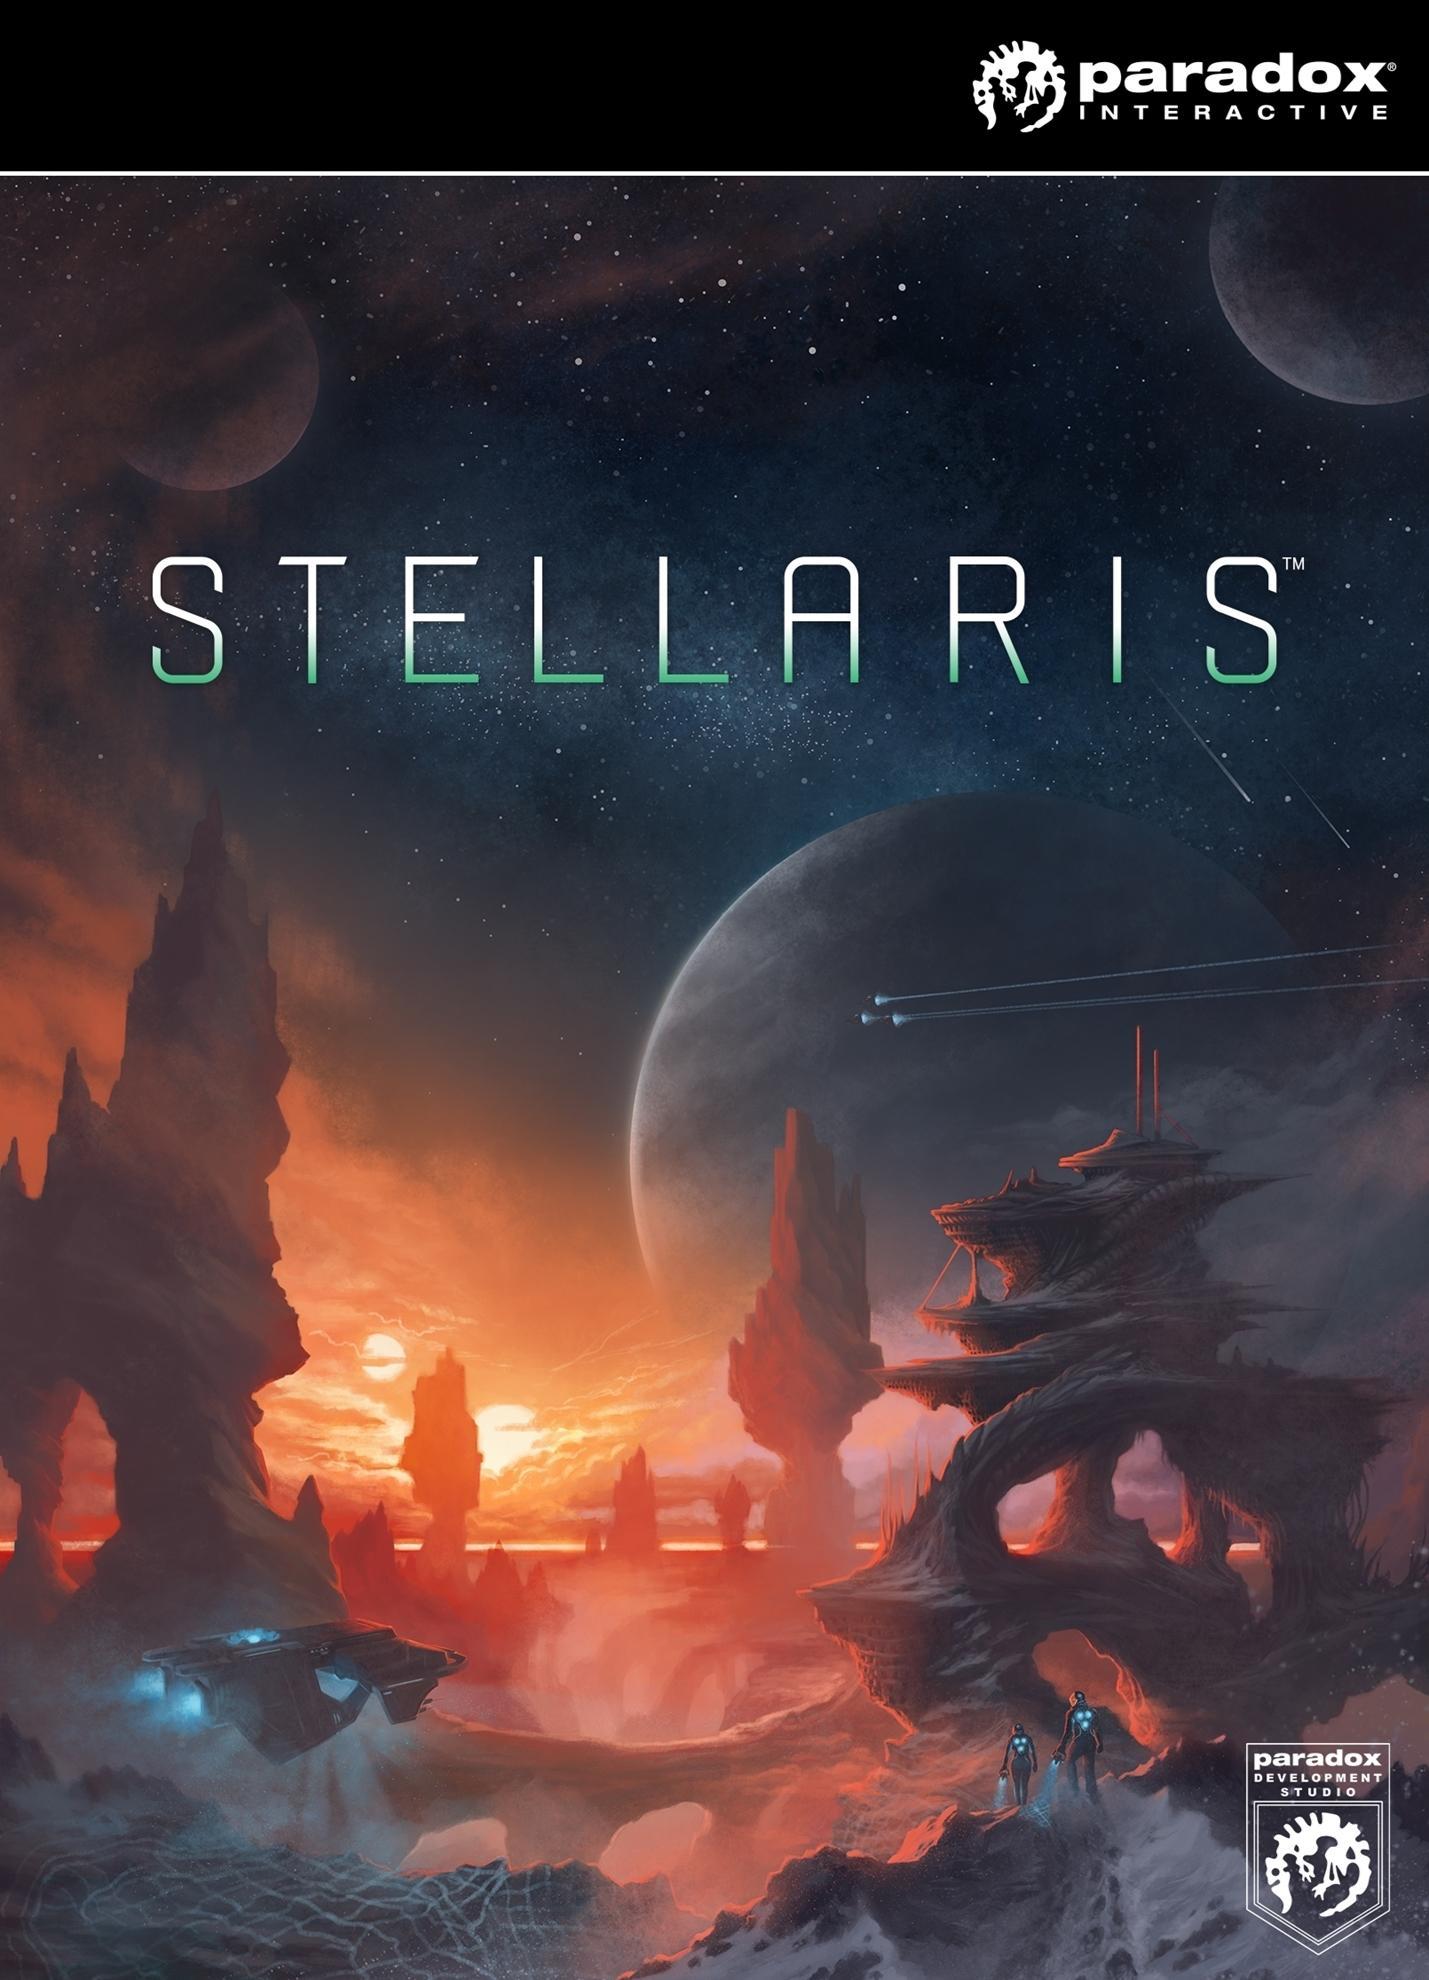 Stellaris | ROW (e0944697-3fb6-40d6-813f-da3dee7b703e)